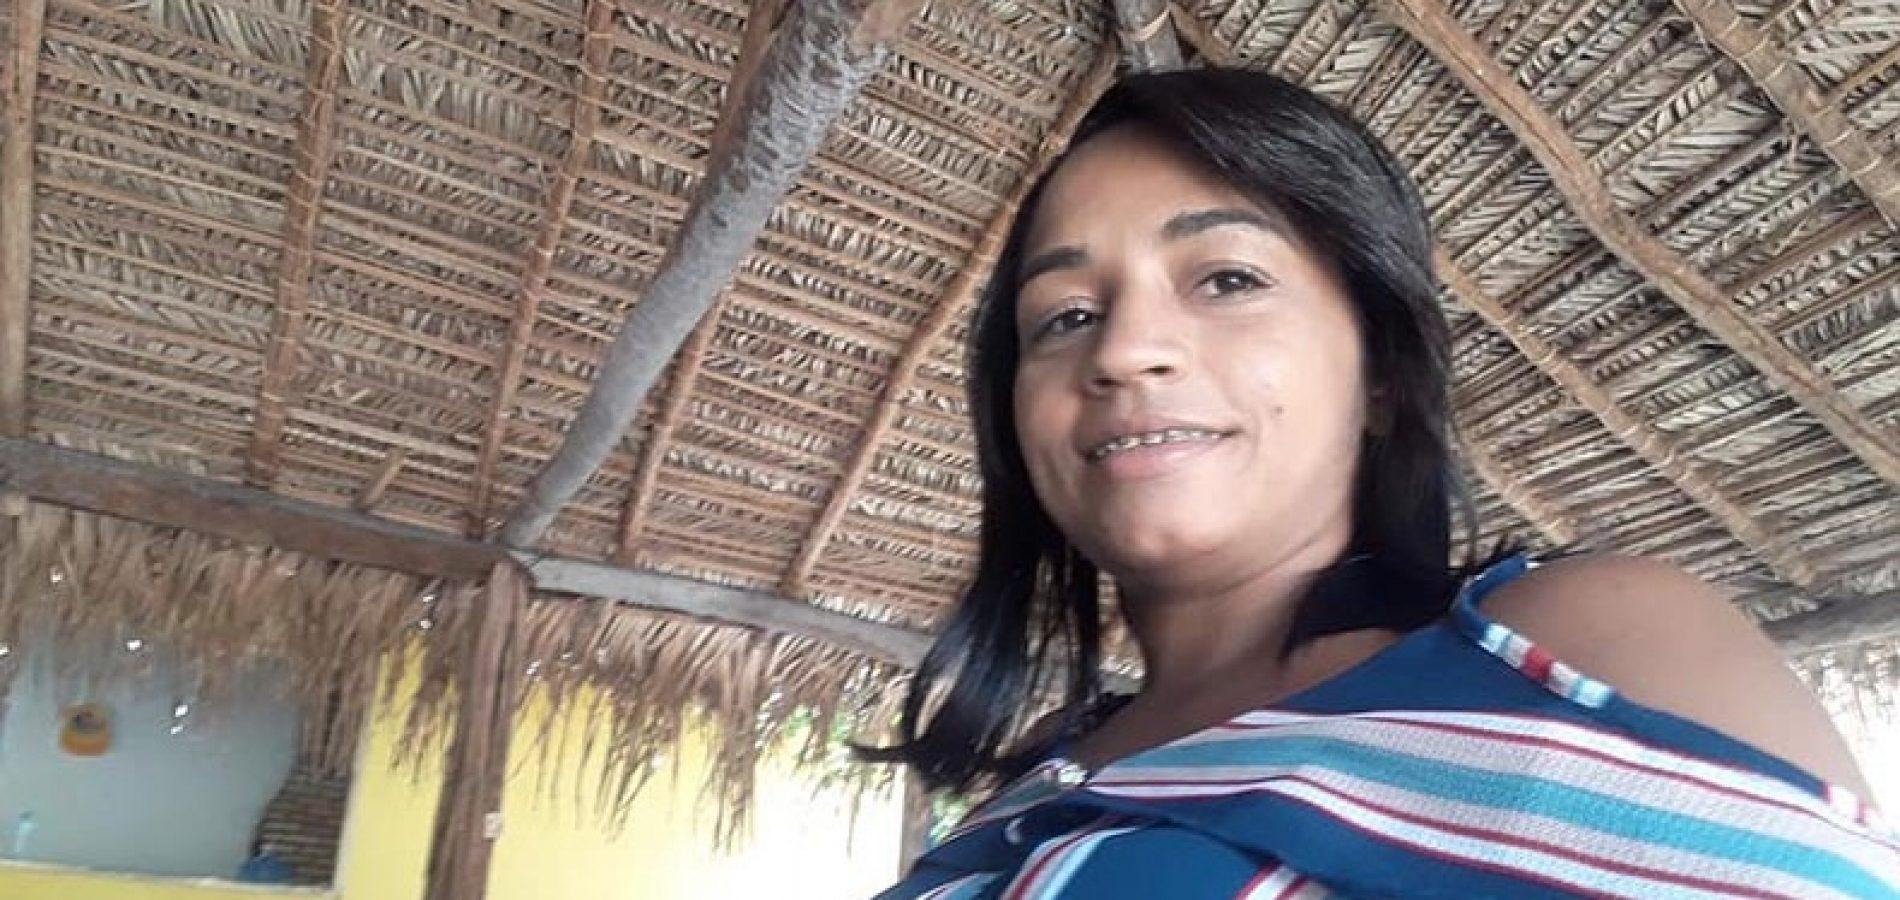 Mulher é assassinada a facadas no interior do Piauí; suspeito enterra roupa e arma